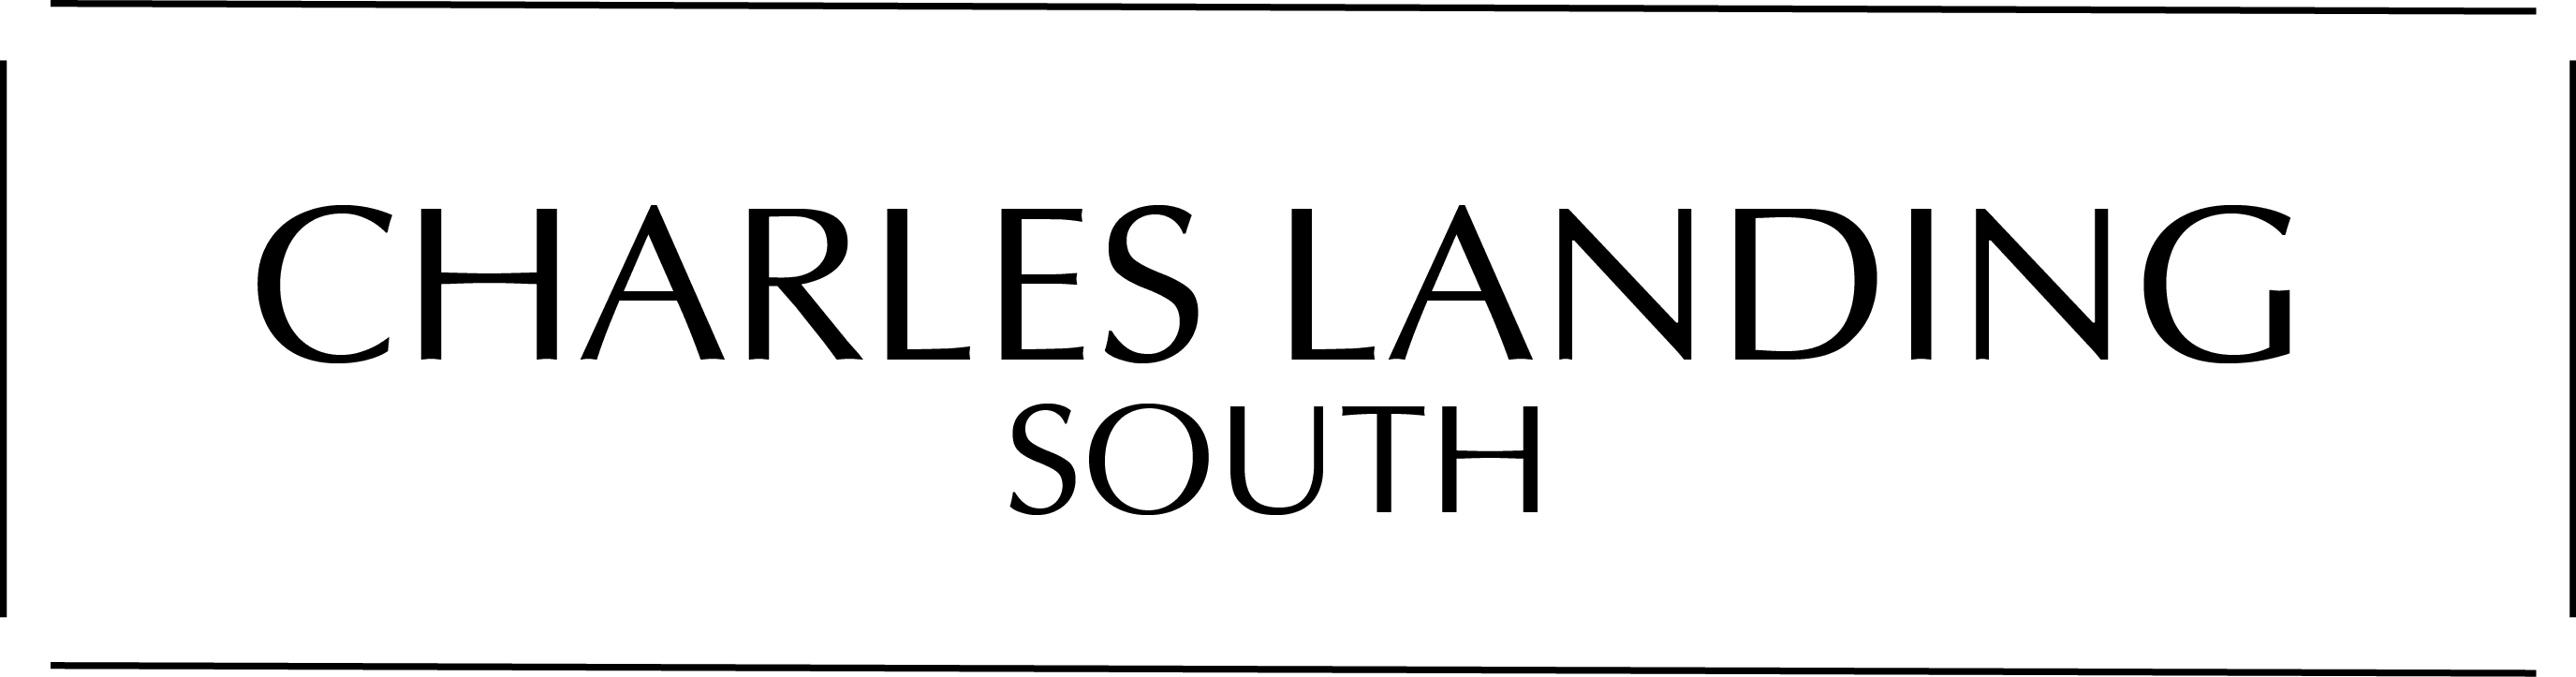 Charles Landing South